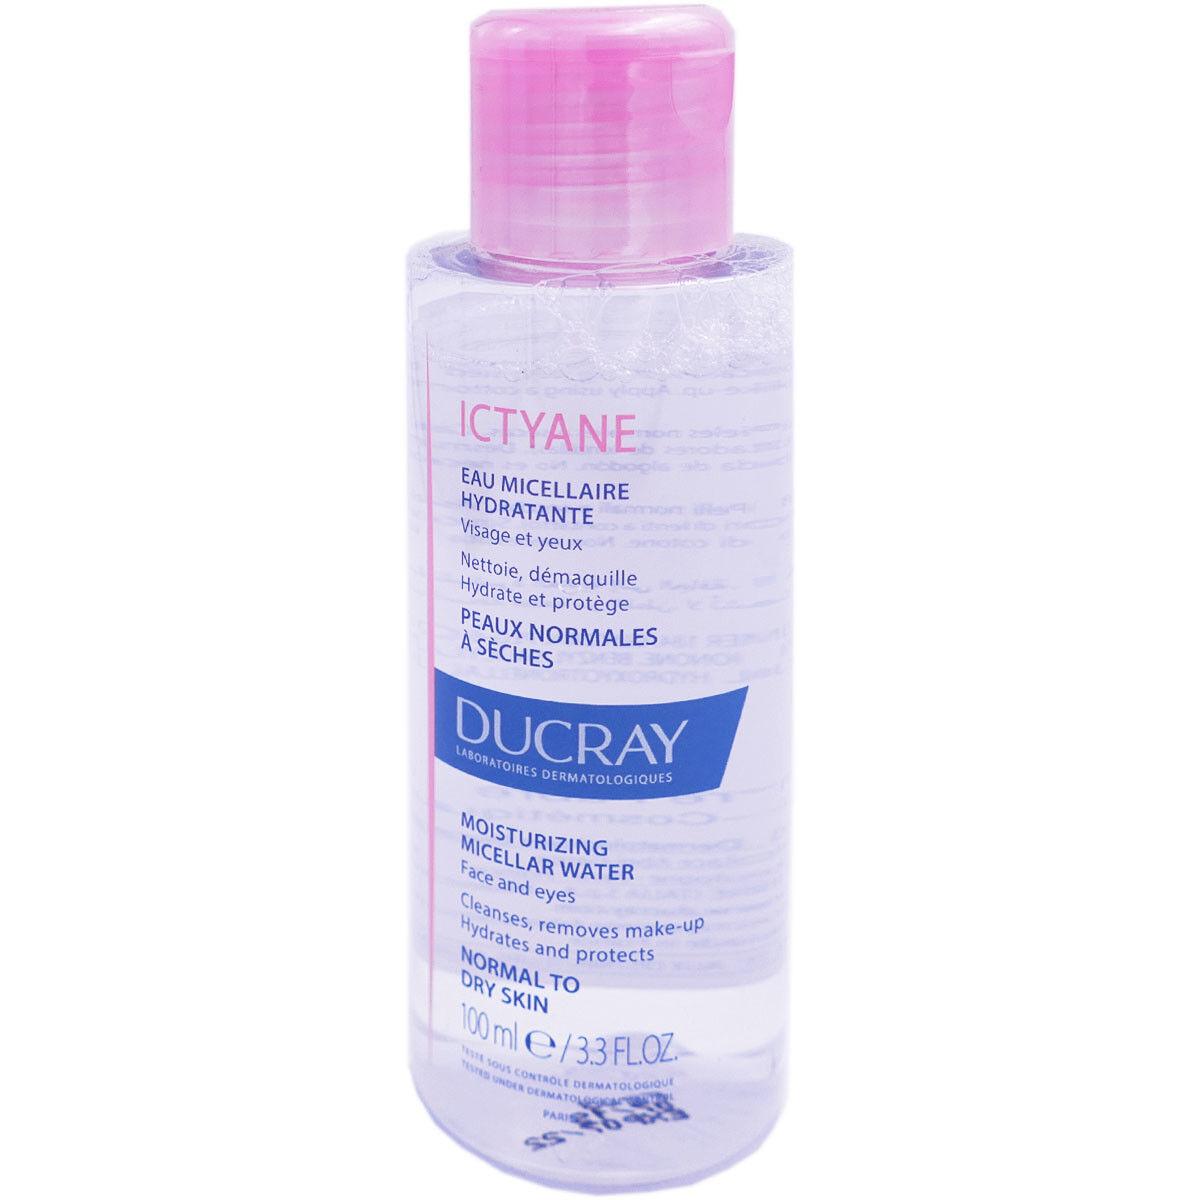 Ducray ictyane eau micellaire hydratante 100ml